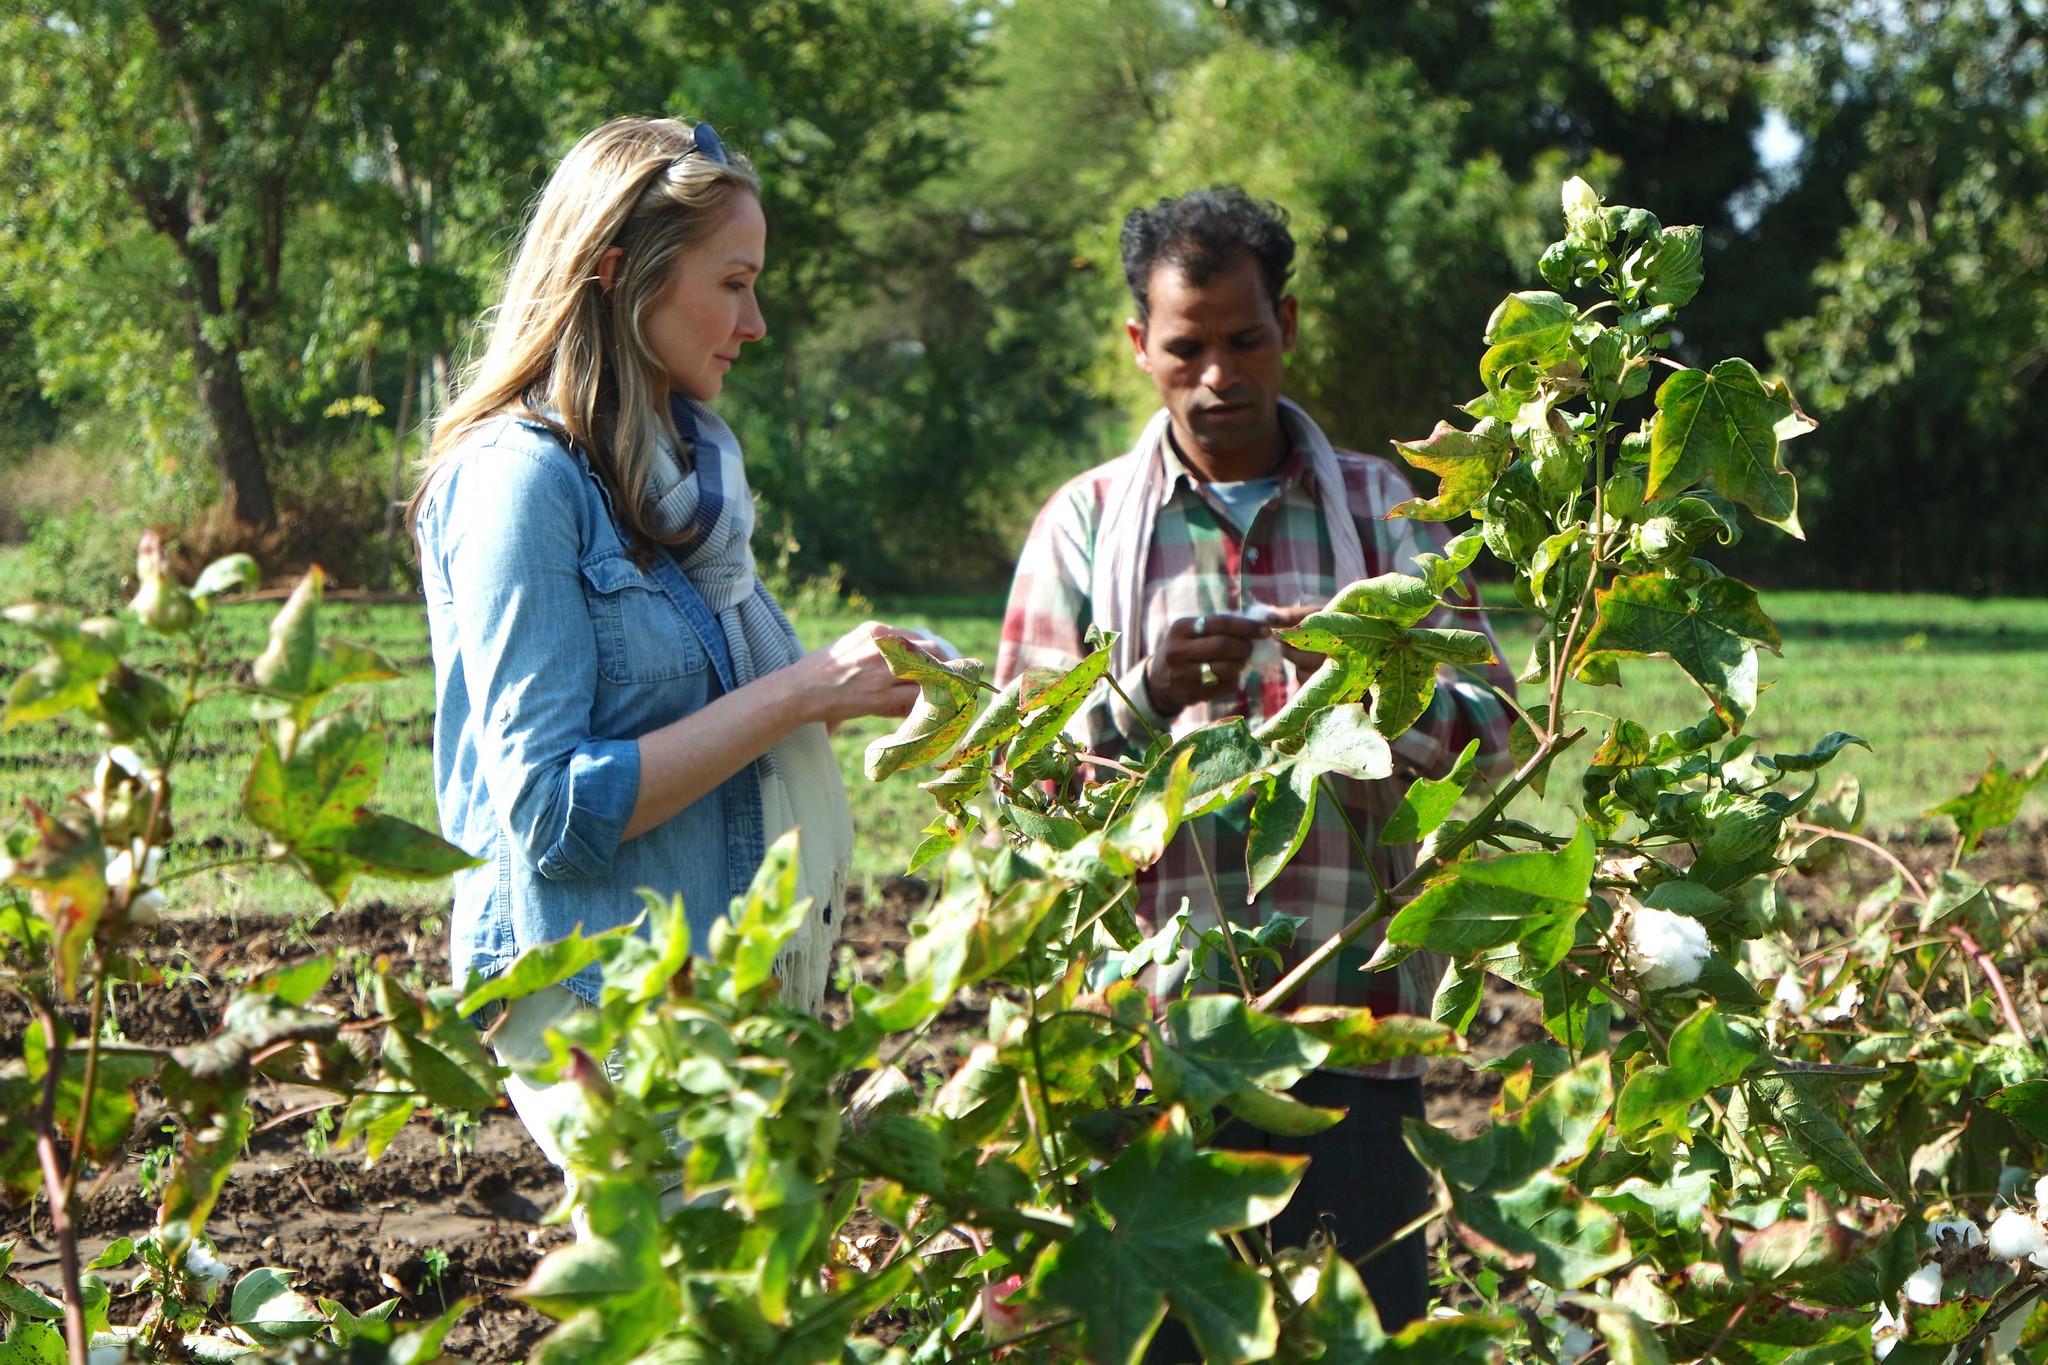 alexandra cousteau and organic cotton farmer ter singh - 2015 mirella pappalardo.jpg